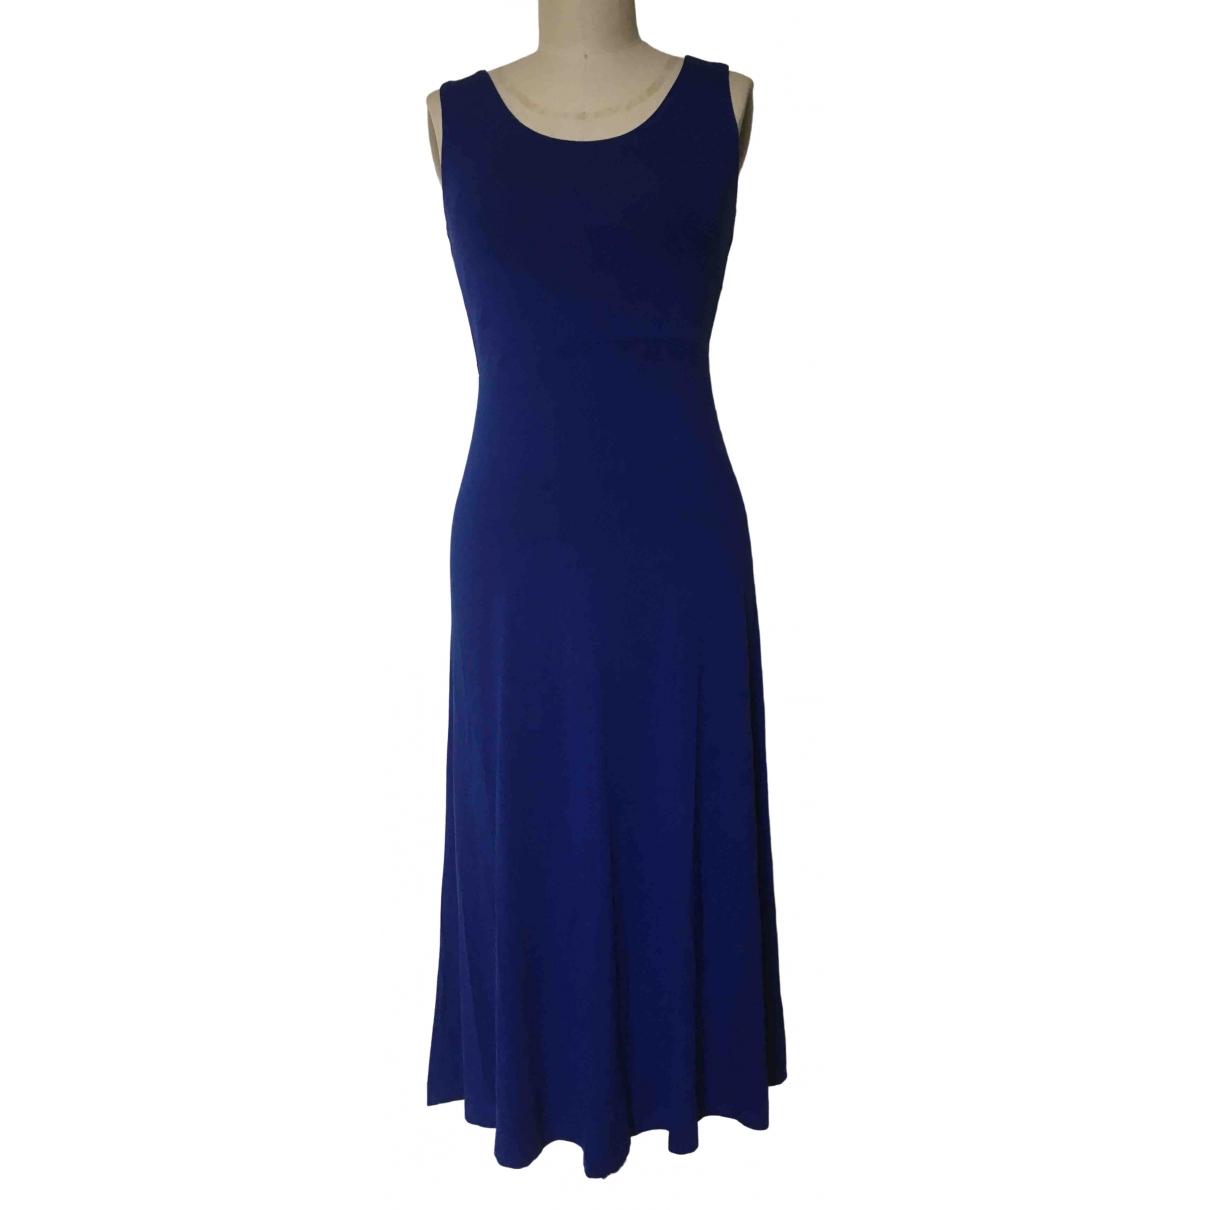 Cynthia Rowley - Robe   pour femme - bleu